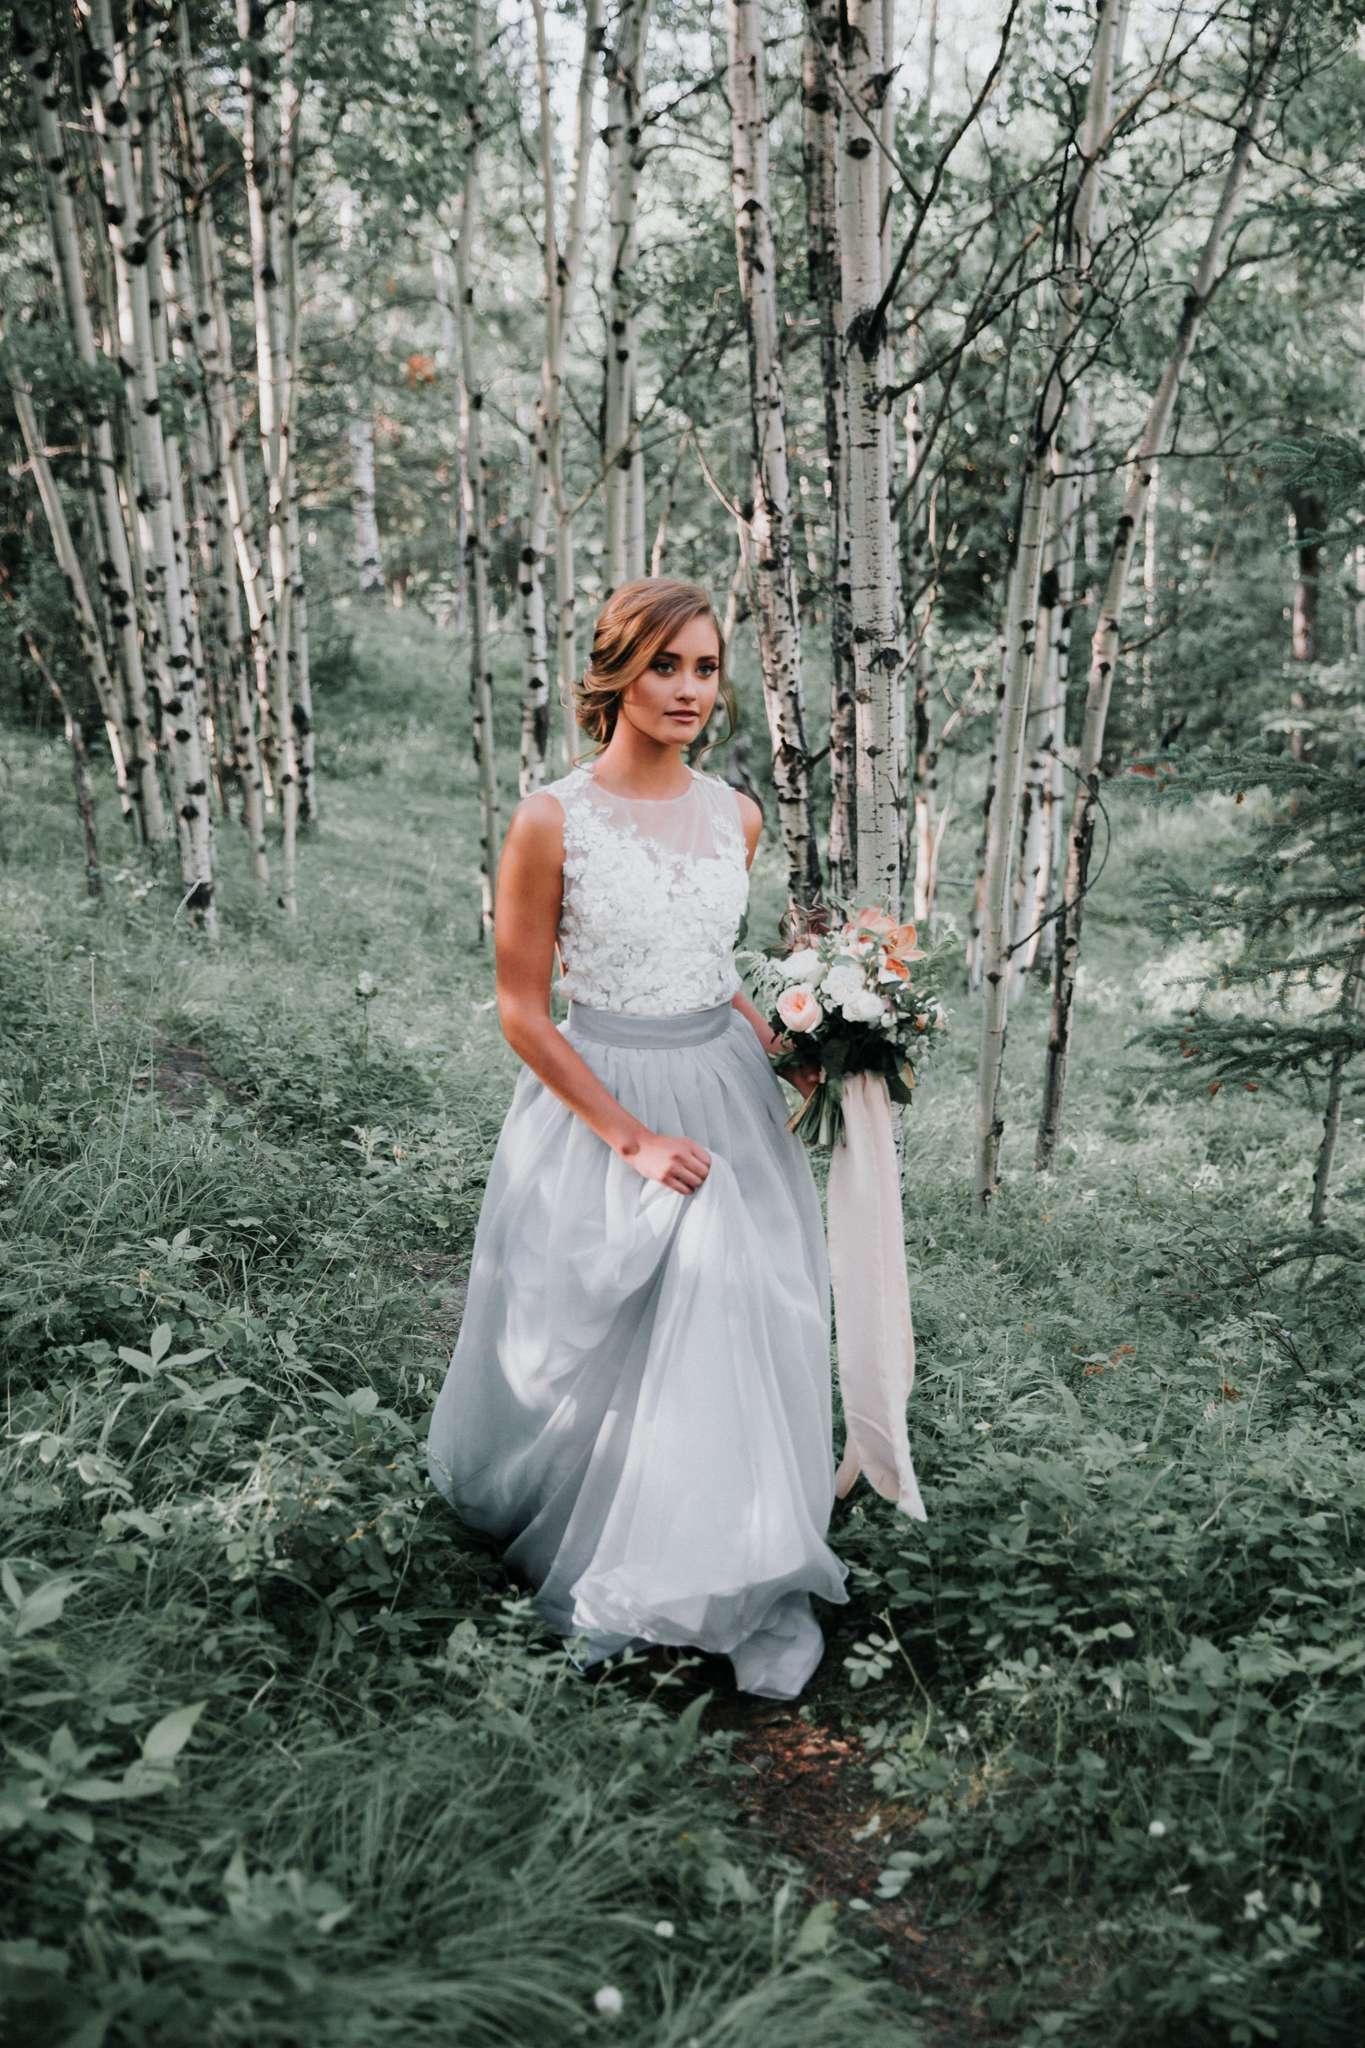 banff wedding photographer, banff wedding photographers, banff wedding photography, banff adventure photographer, banff adventure photographers